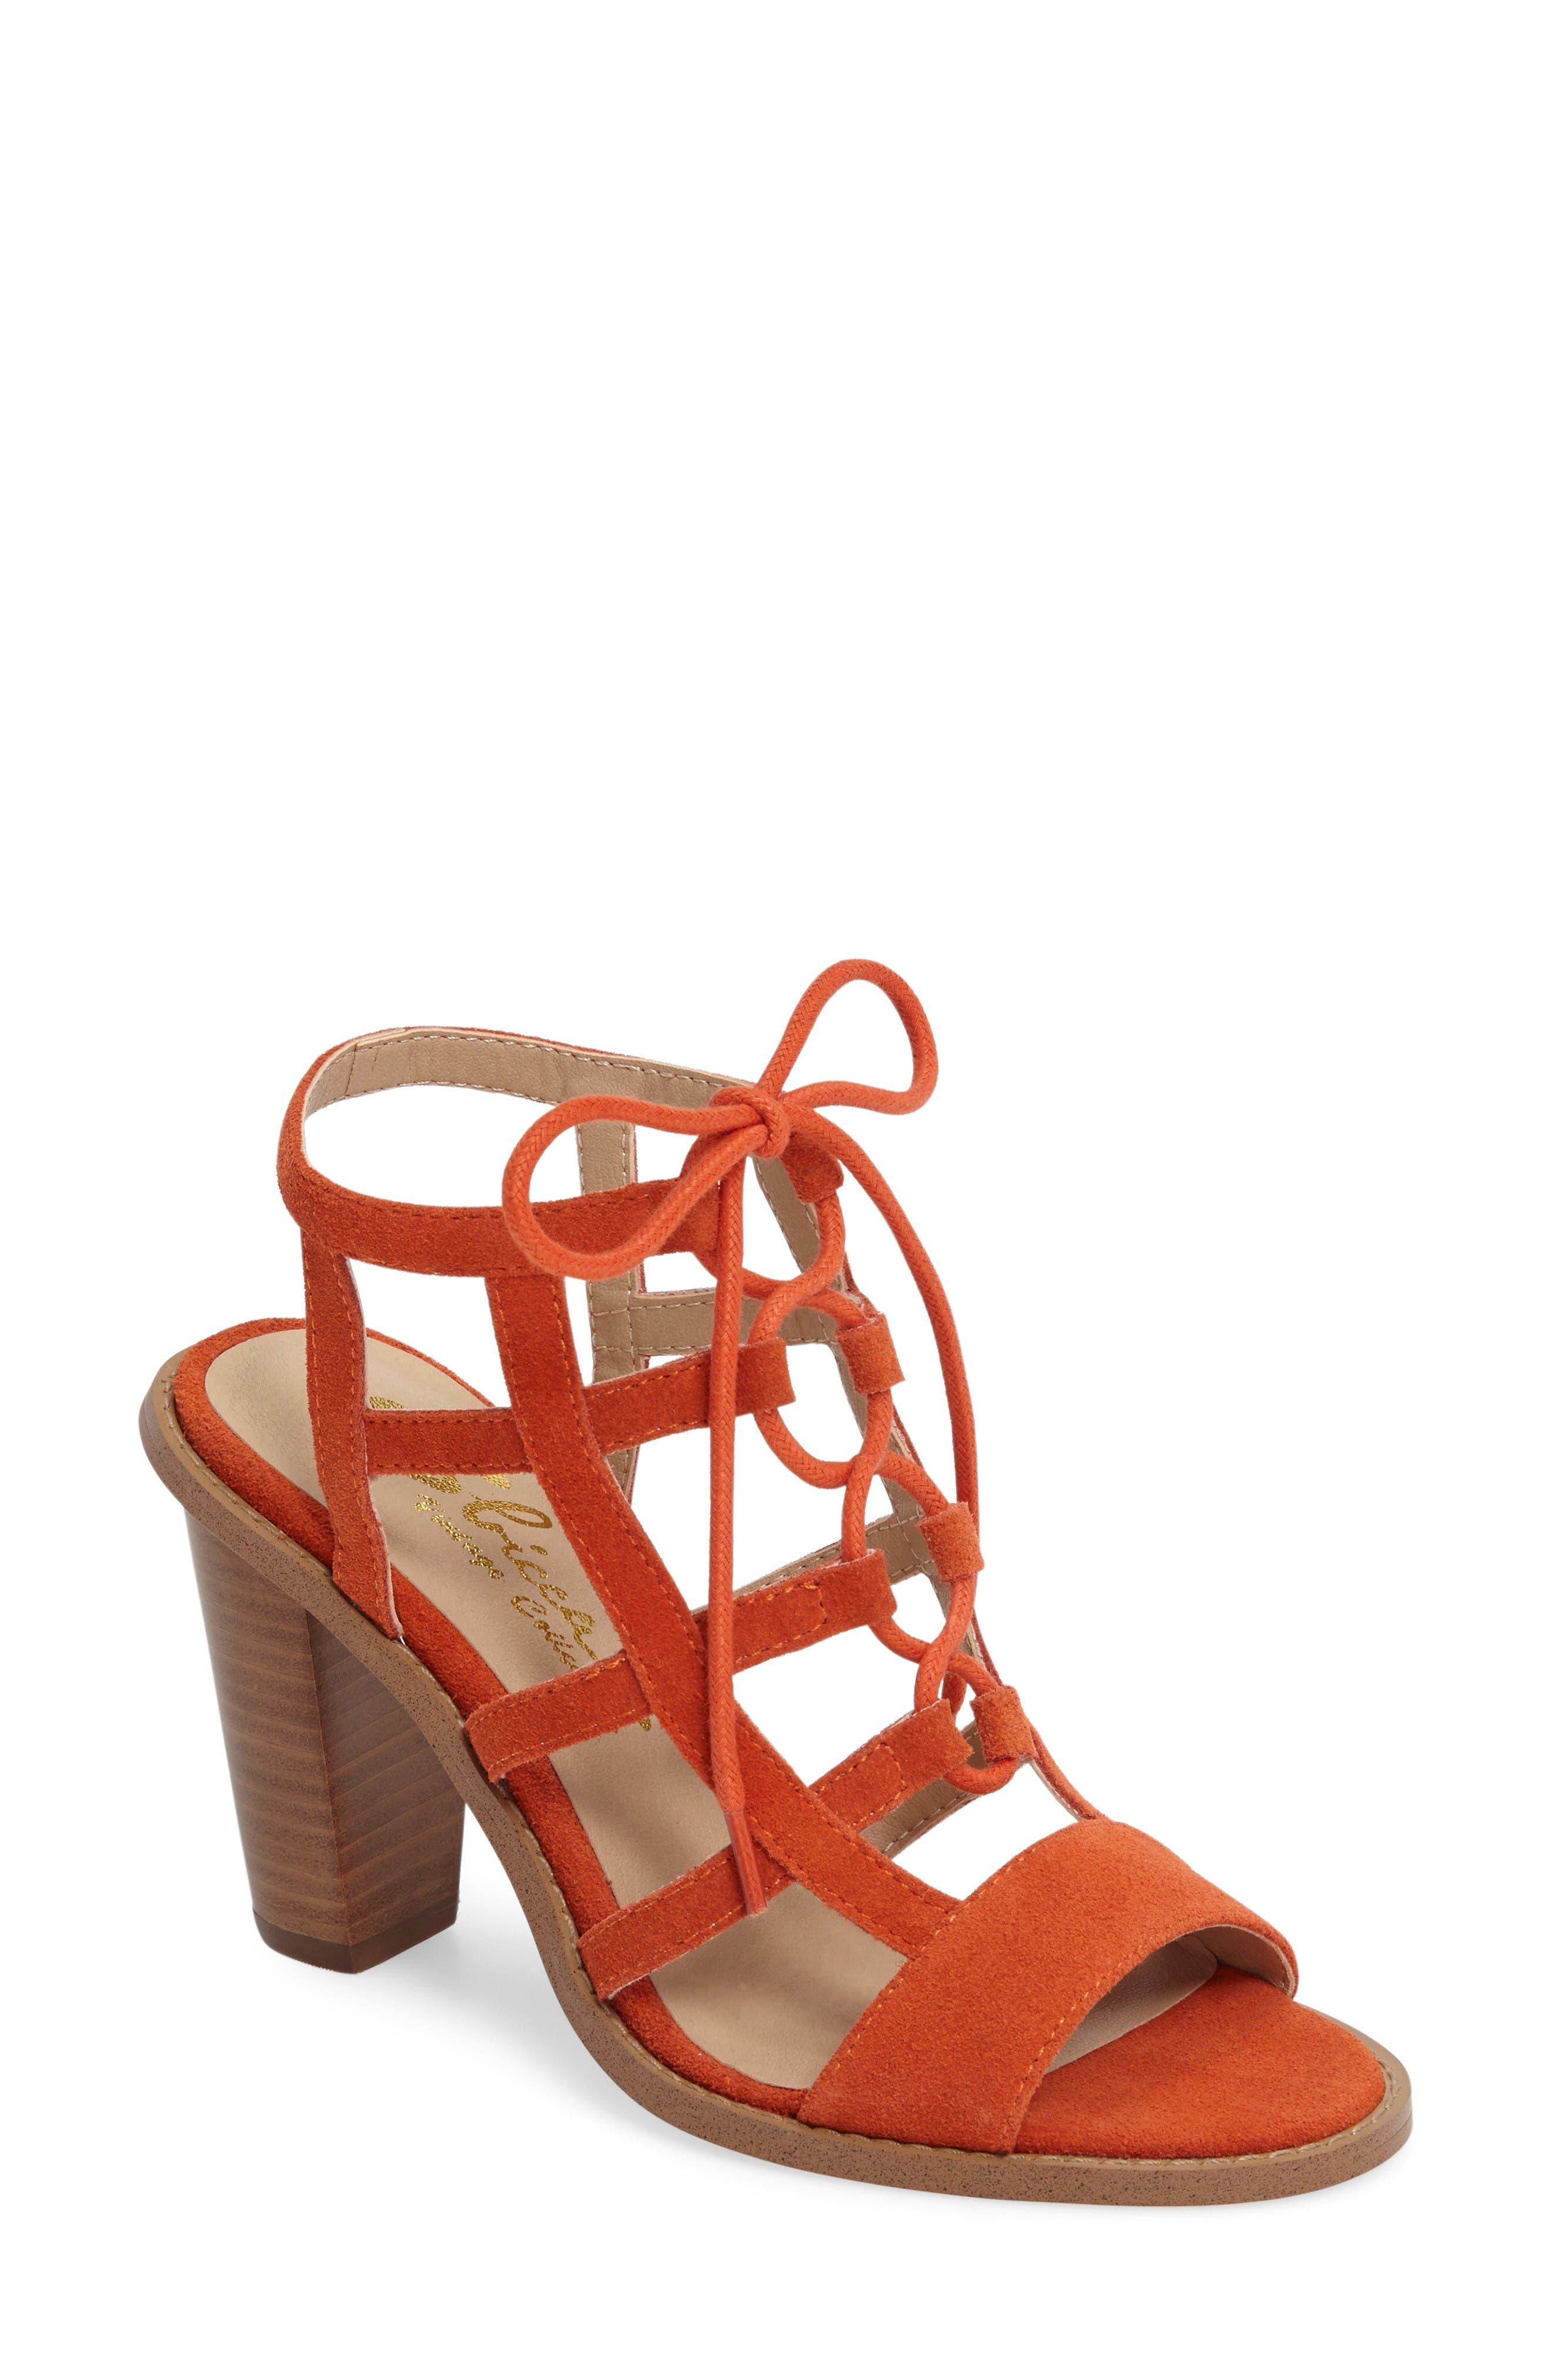 Sanni Cage Sandal,                             Main thumbnail 1, color,                             Orange Leather